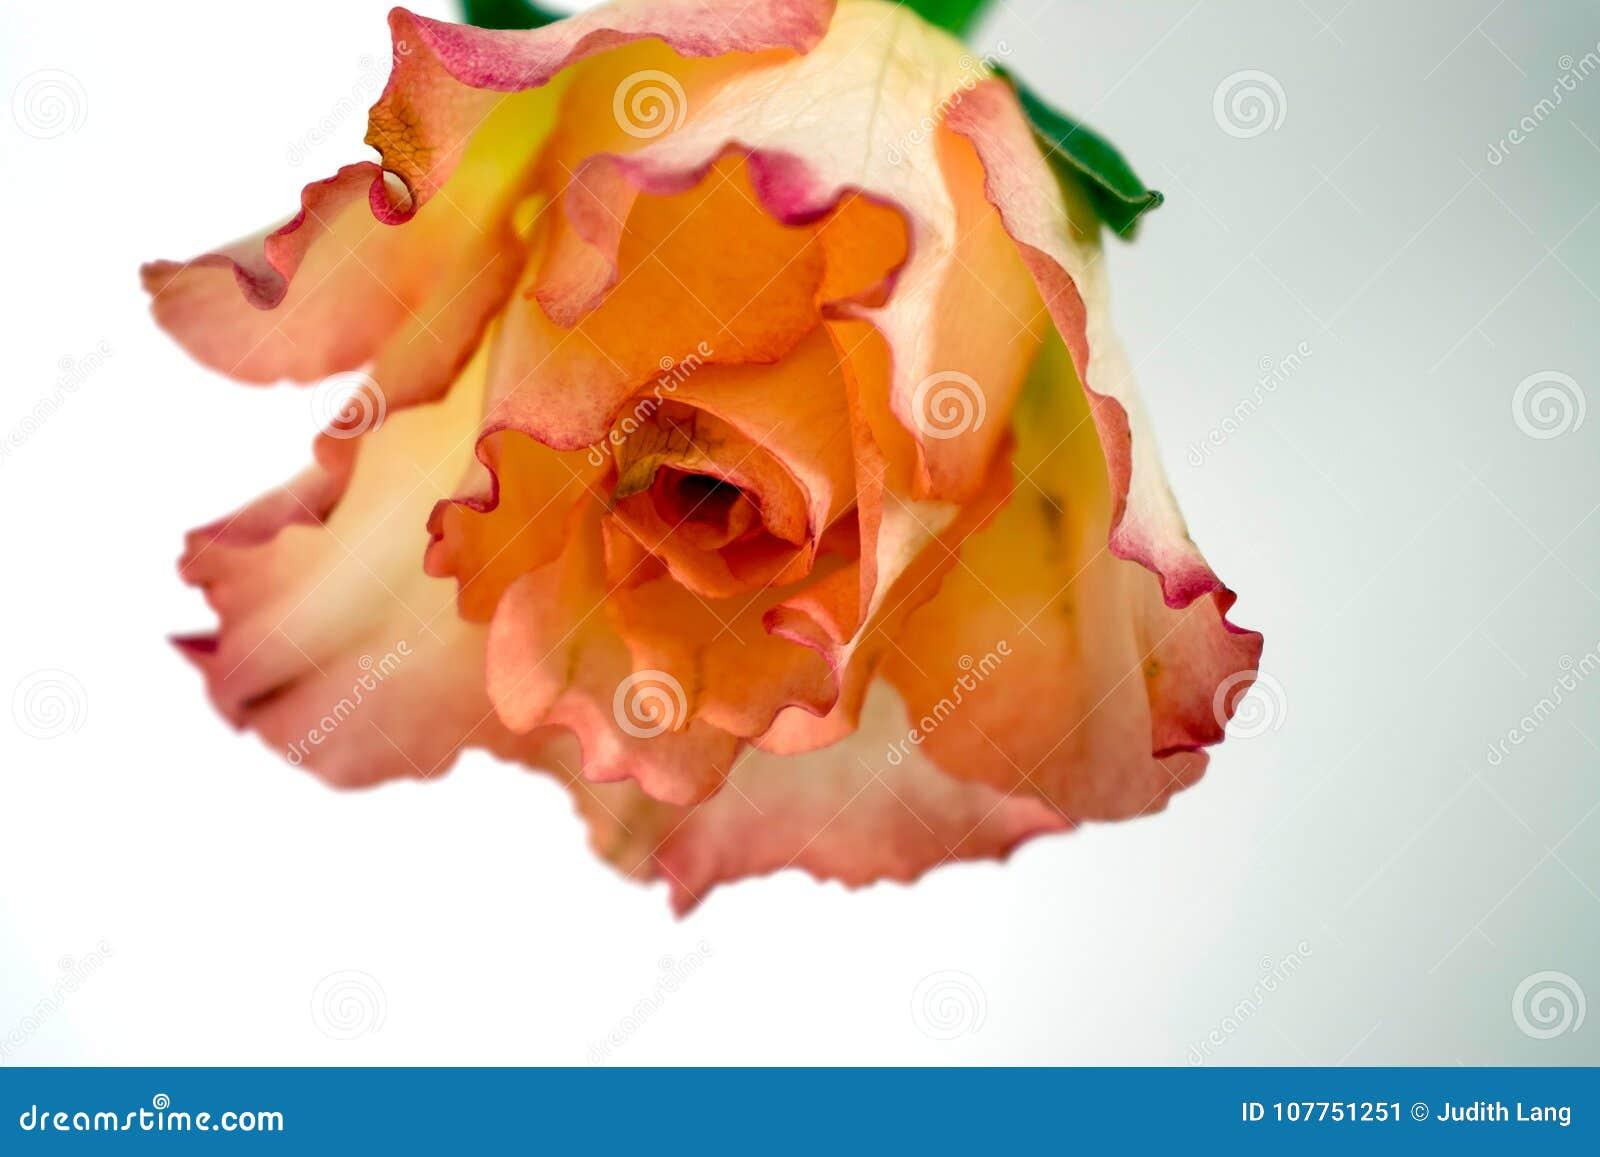 Upside Down Pink And Orange Rose Stock Image Image Of Flora